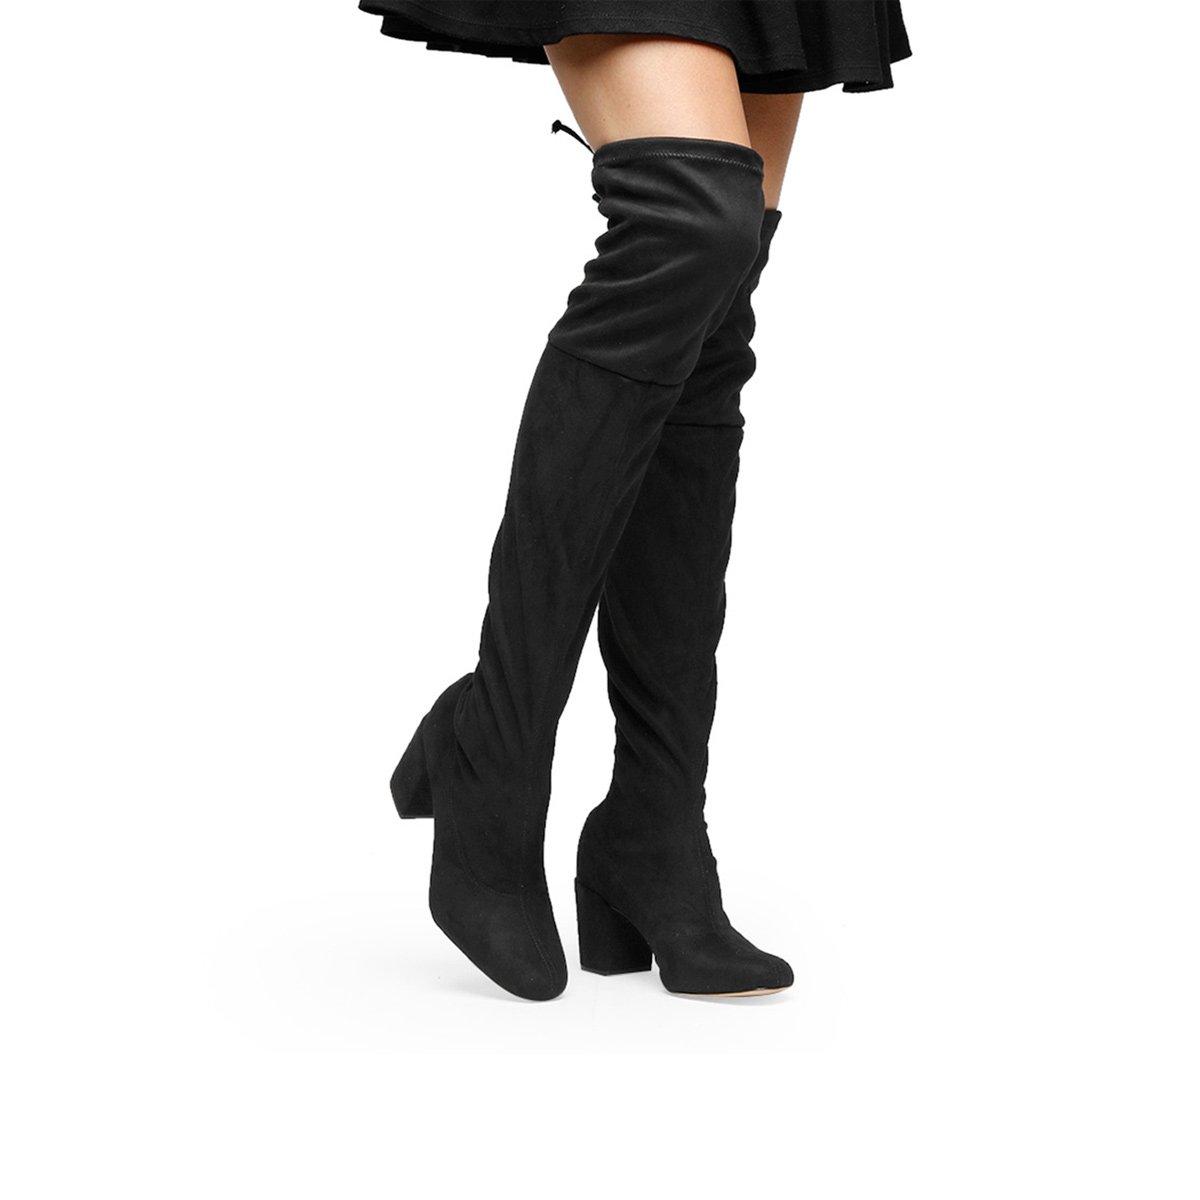 ebc5d99b96 Bota Meia Over The Knee Shoestock Salto Grosso Feminina